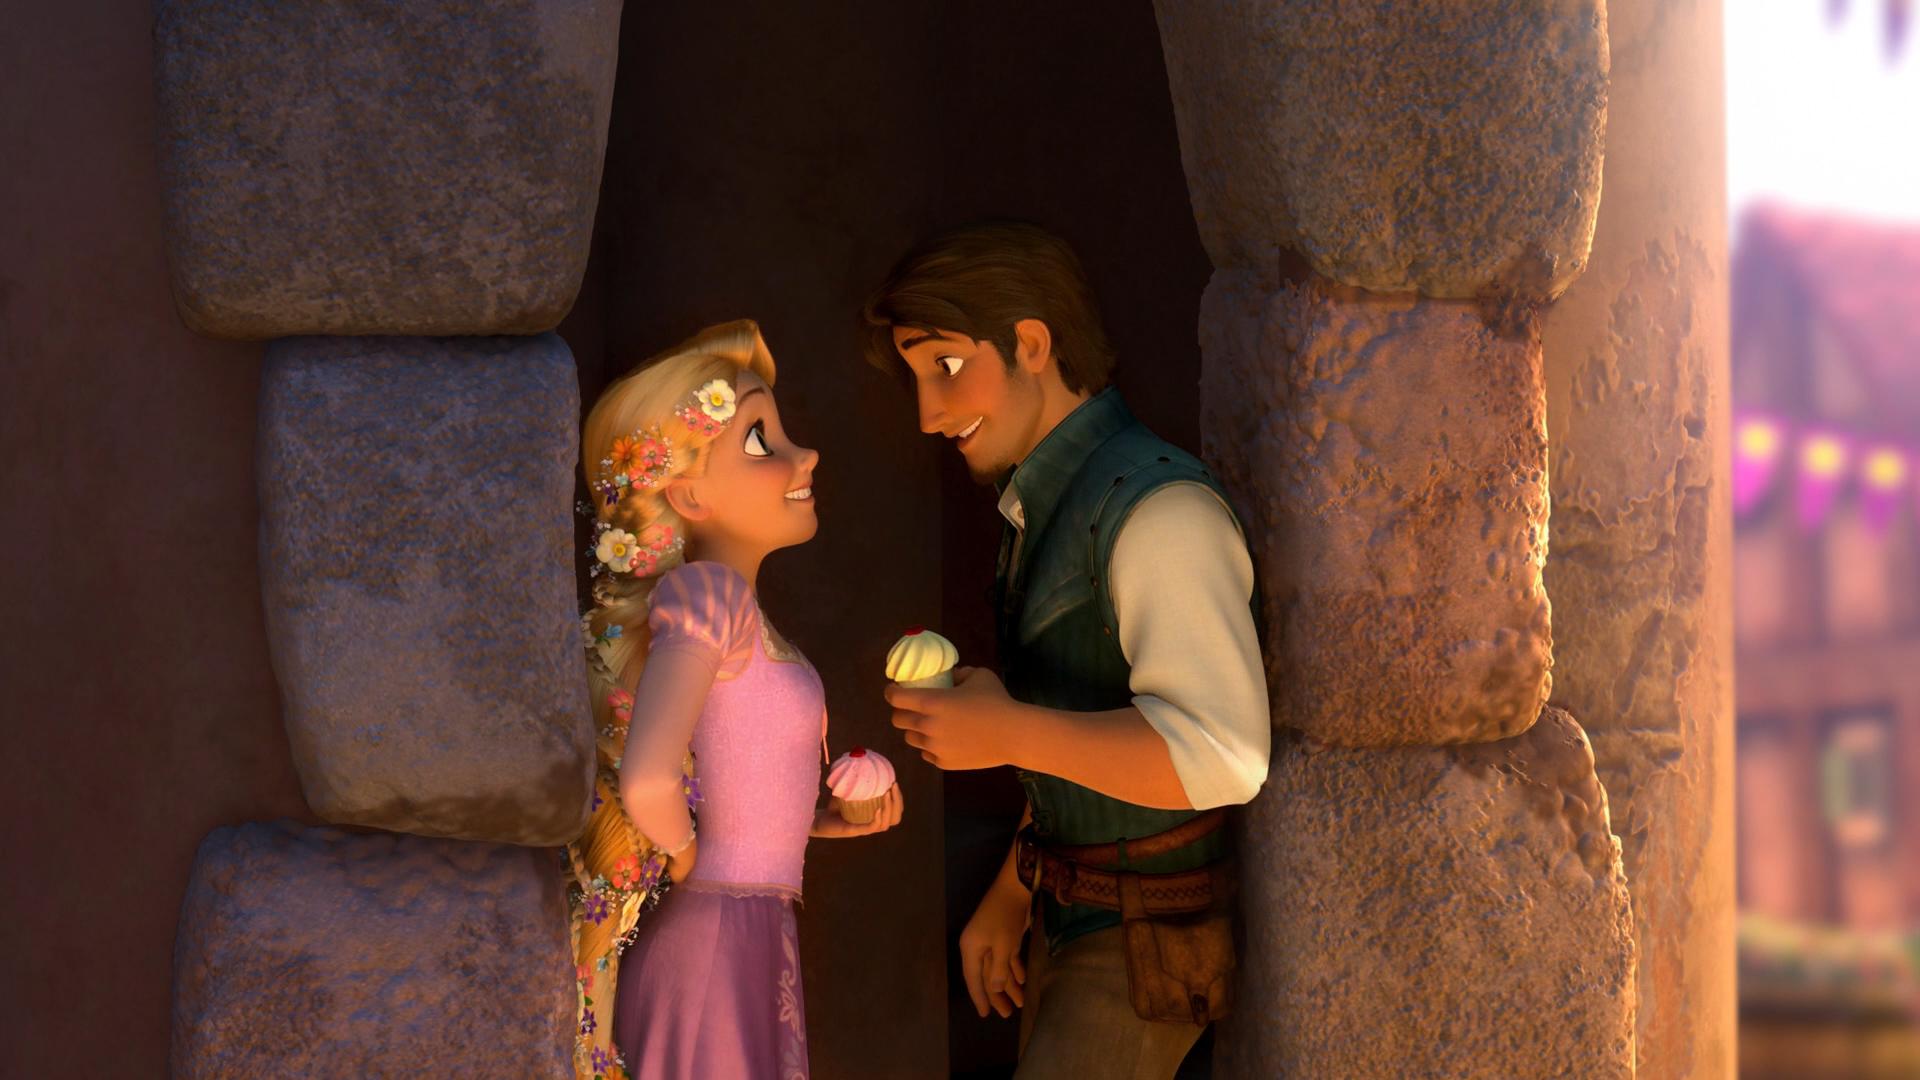 Flynn And Rapunzel 4ever Love Tangled 22865822 1920 1080